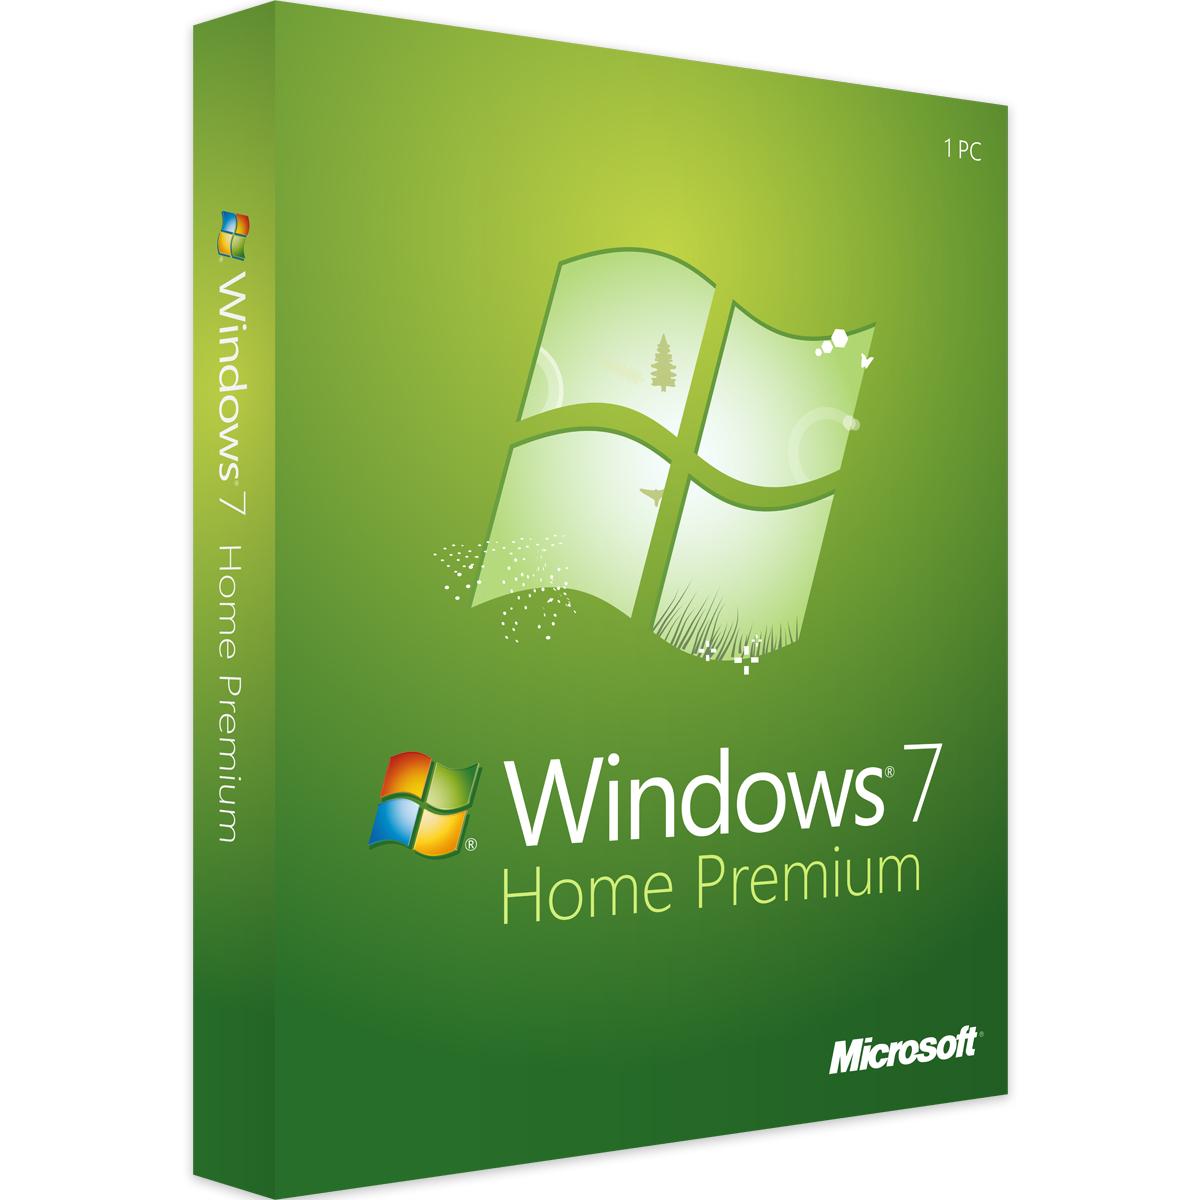 Windows 7 Home Premium 3264bit Instant Multilanguage Original License Key Win 7 Home Prem OEM Coa